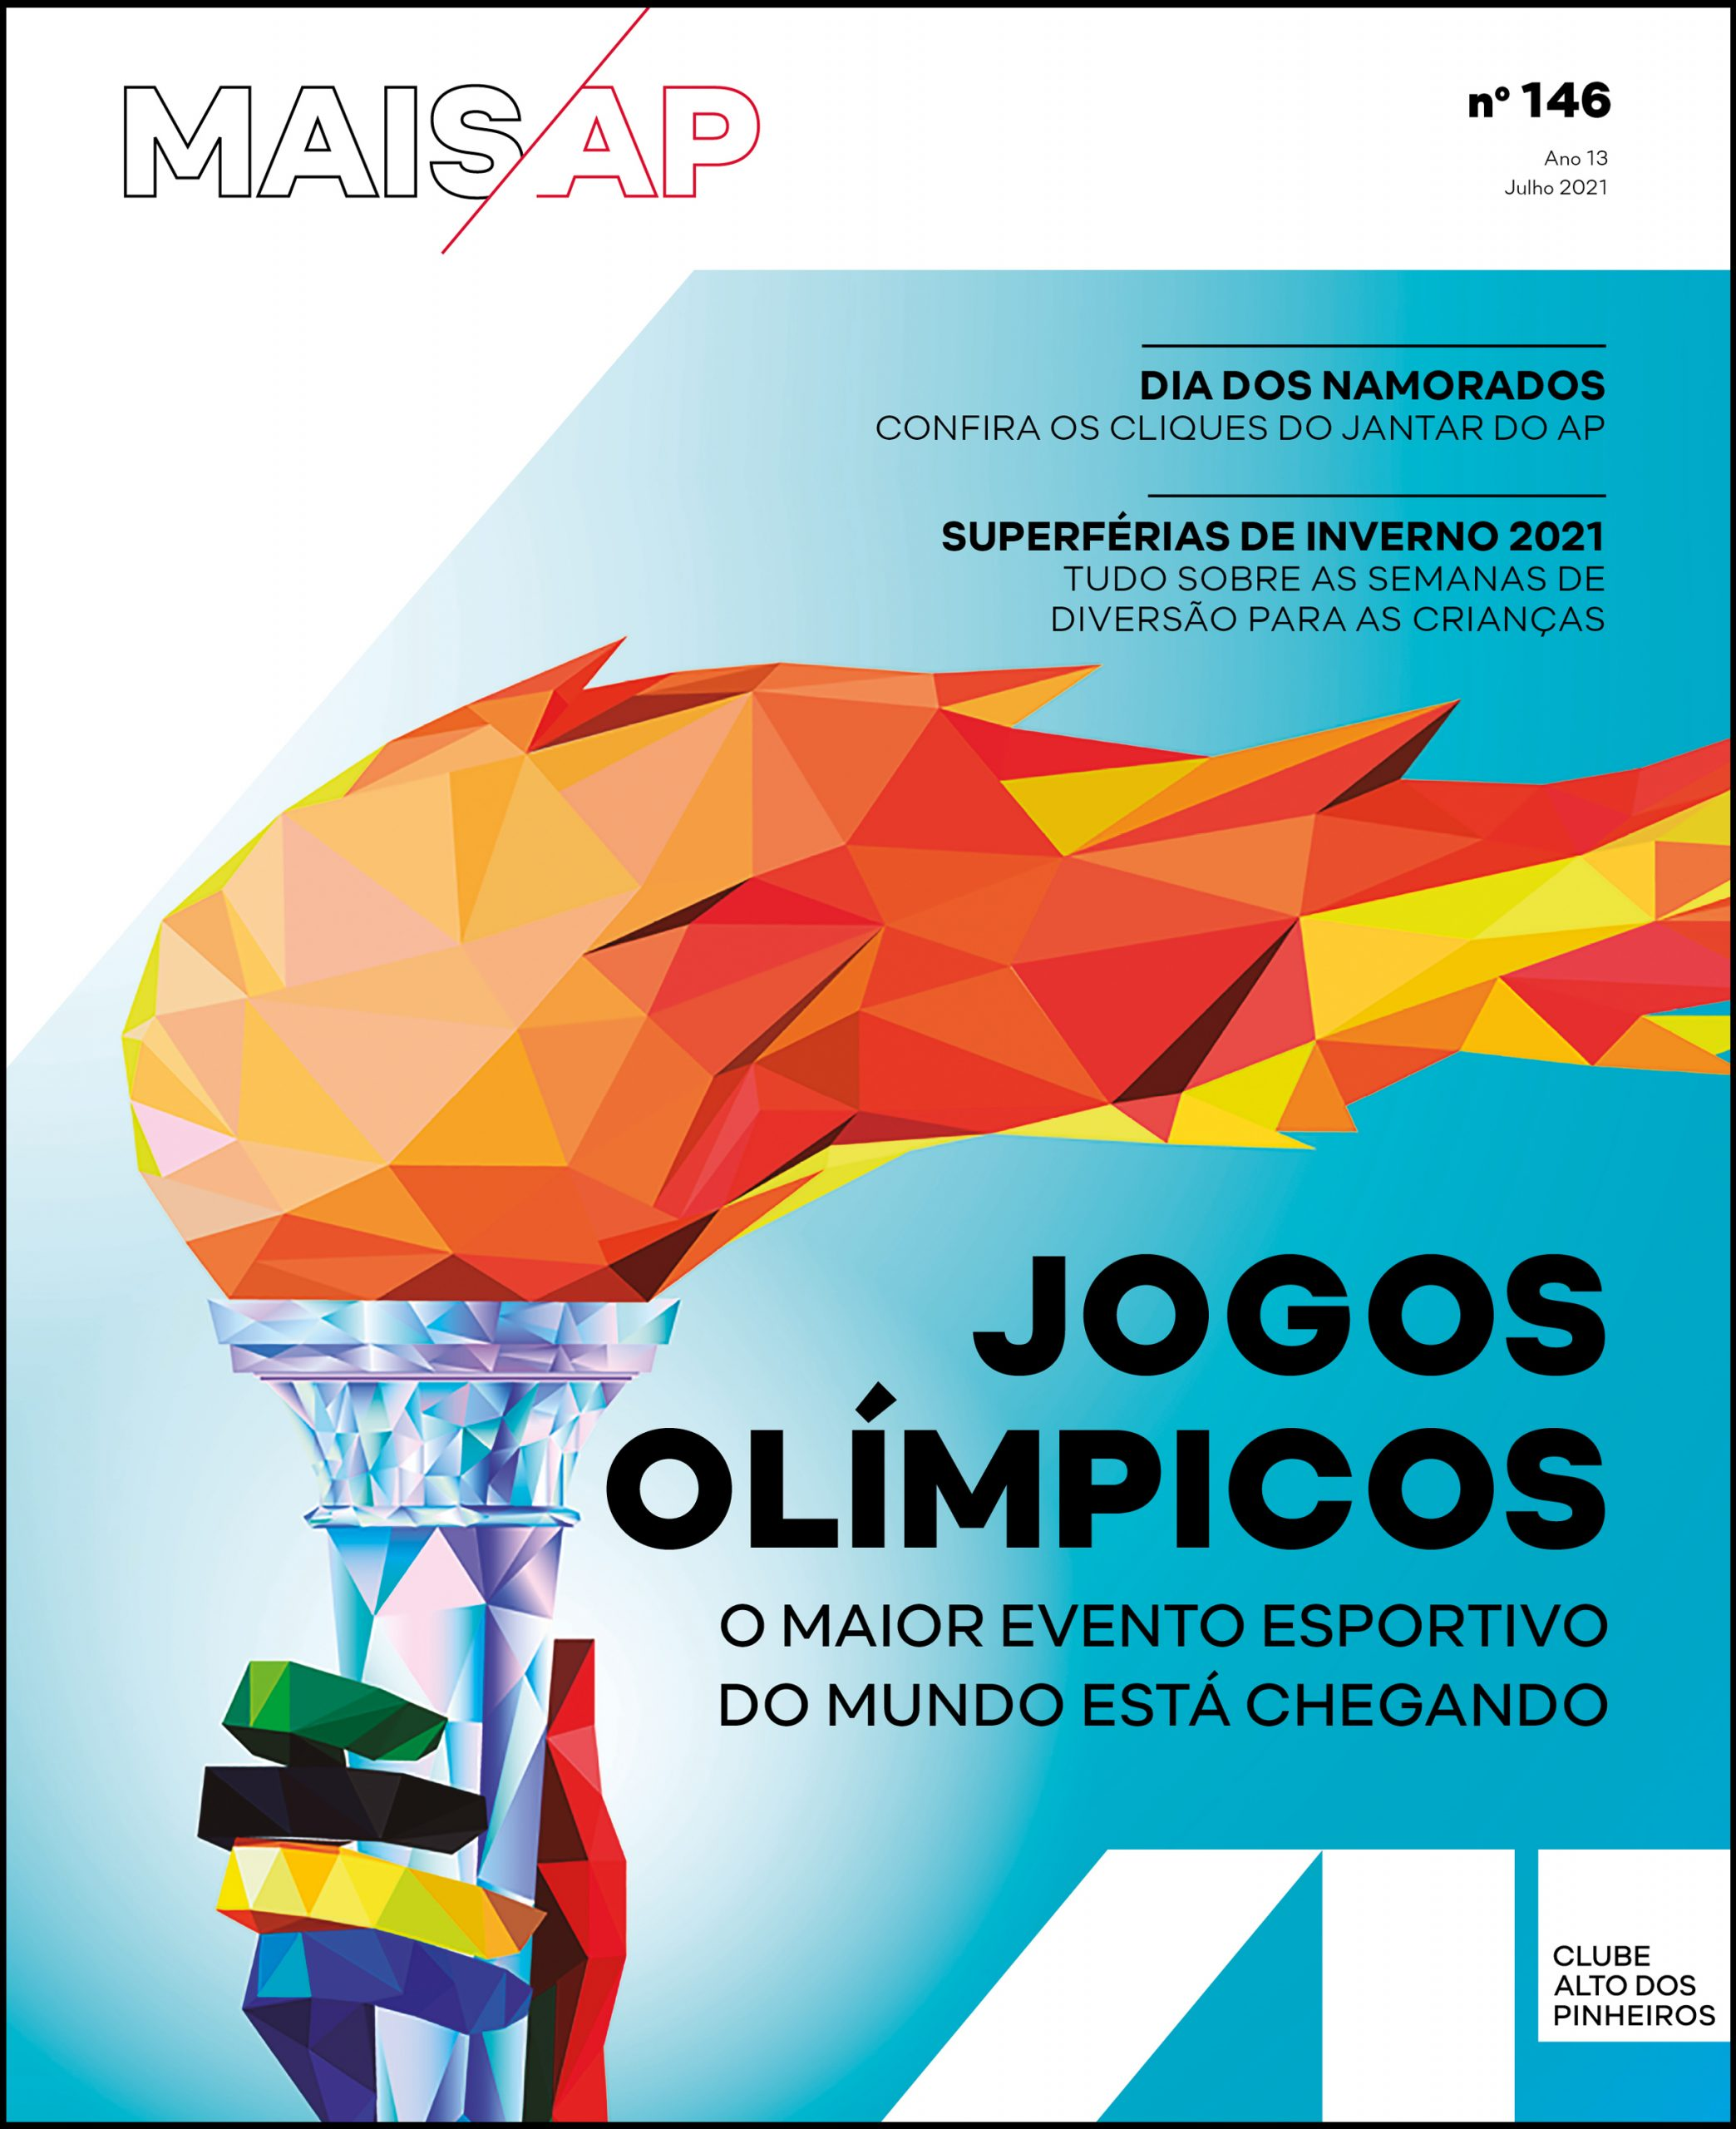 https://www.clubeap.com.br/wp-content/uploads/2021/07/revistamaisap-146-capa-scaled.jpg